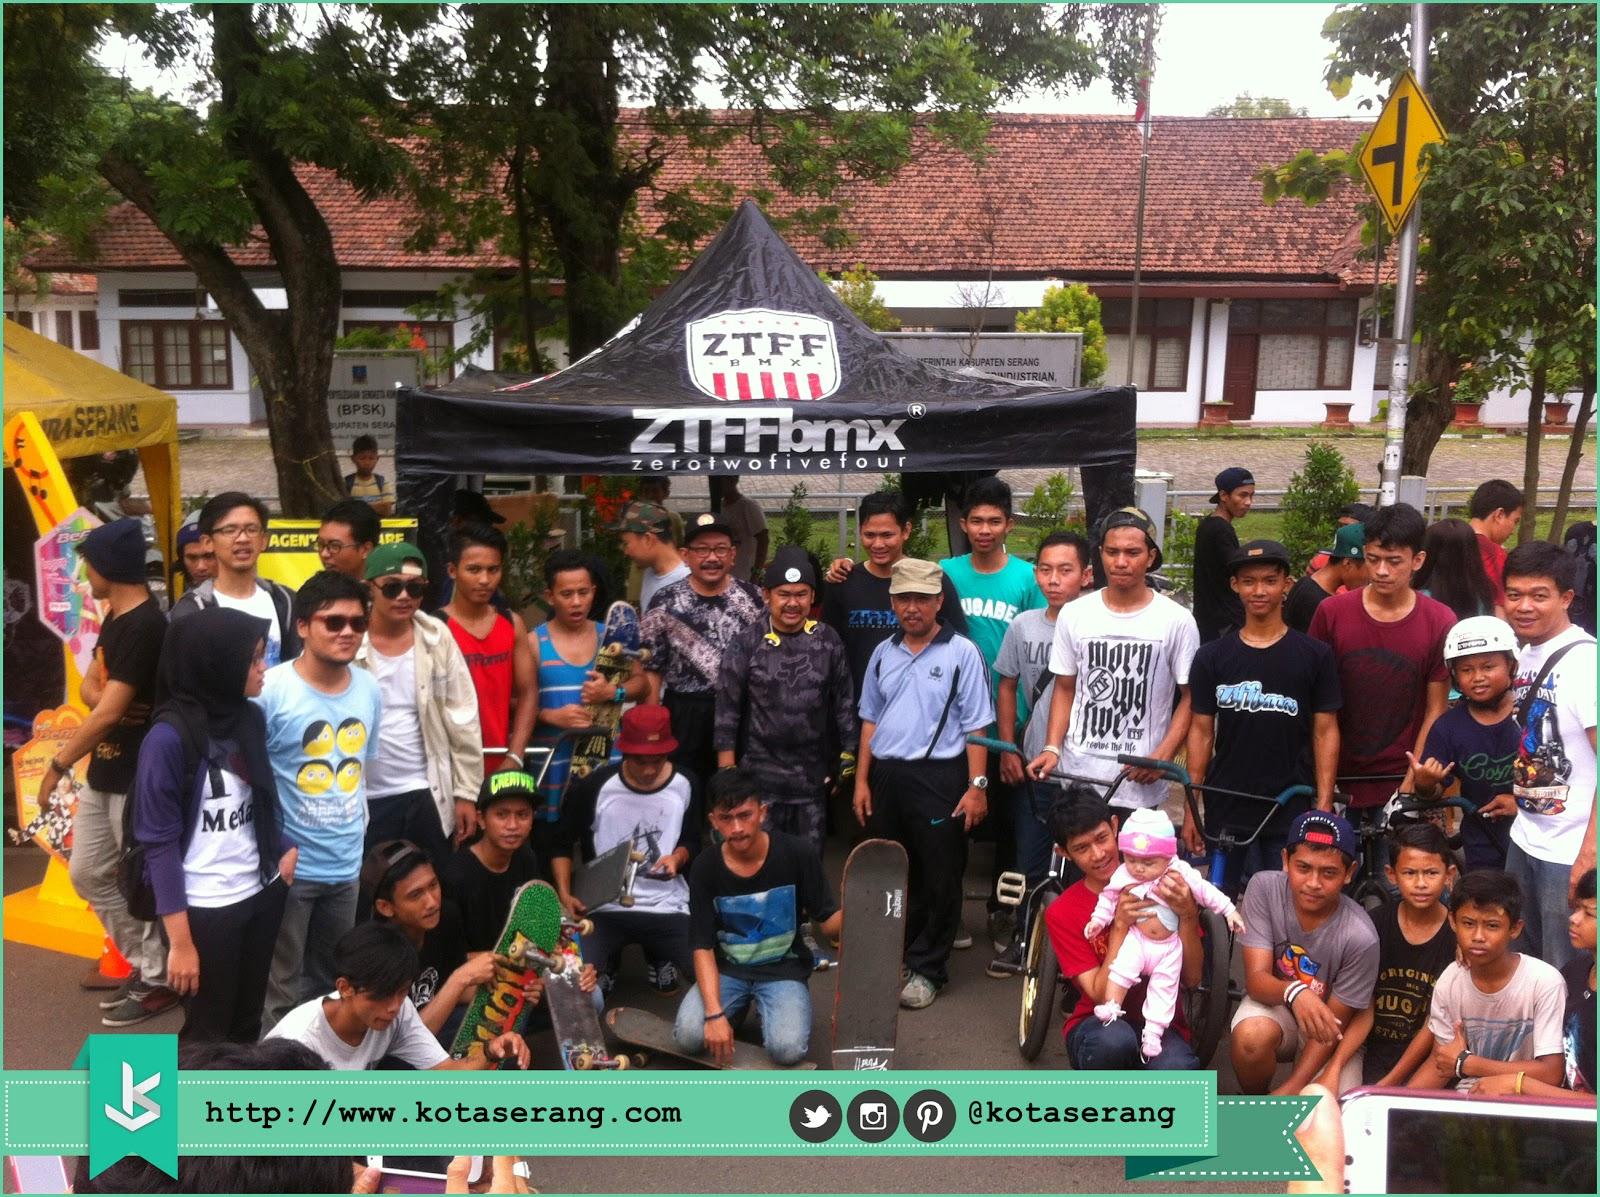 Walikota Serang Foto Bareng dengan Komunitas BMX, Komunitas Skateboard dan Komunitas Akustik Kota Serang